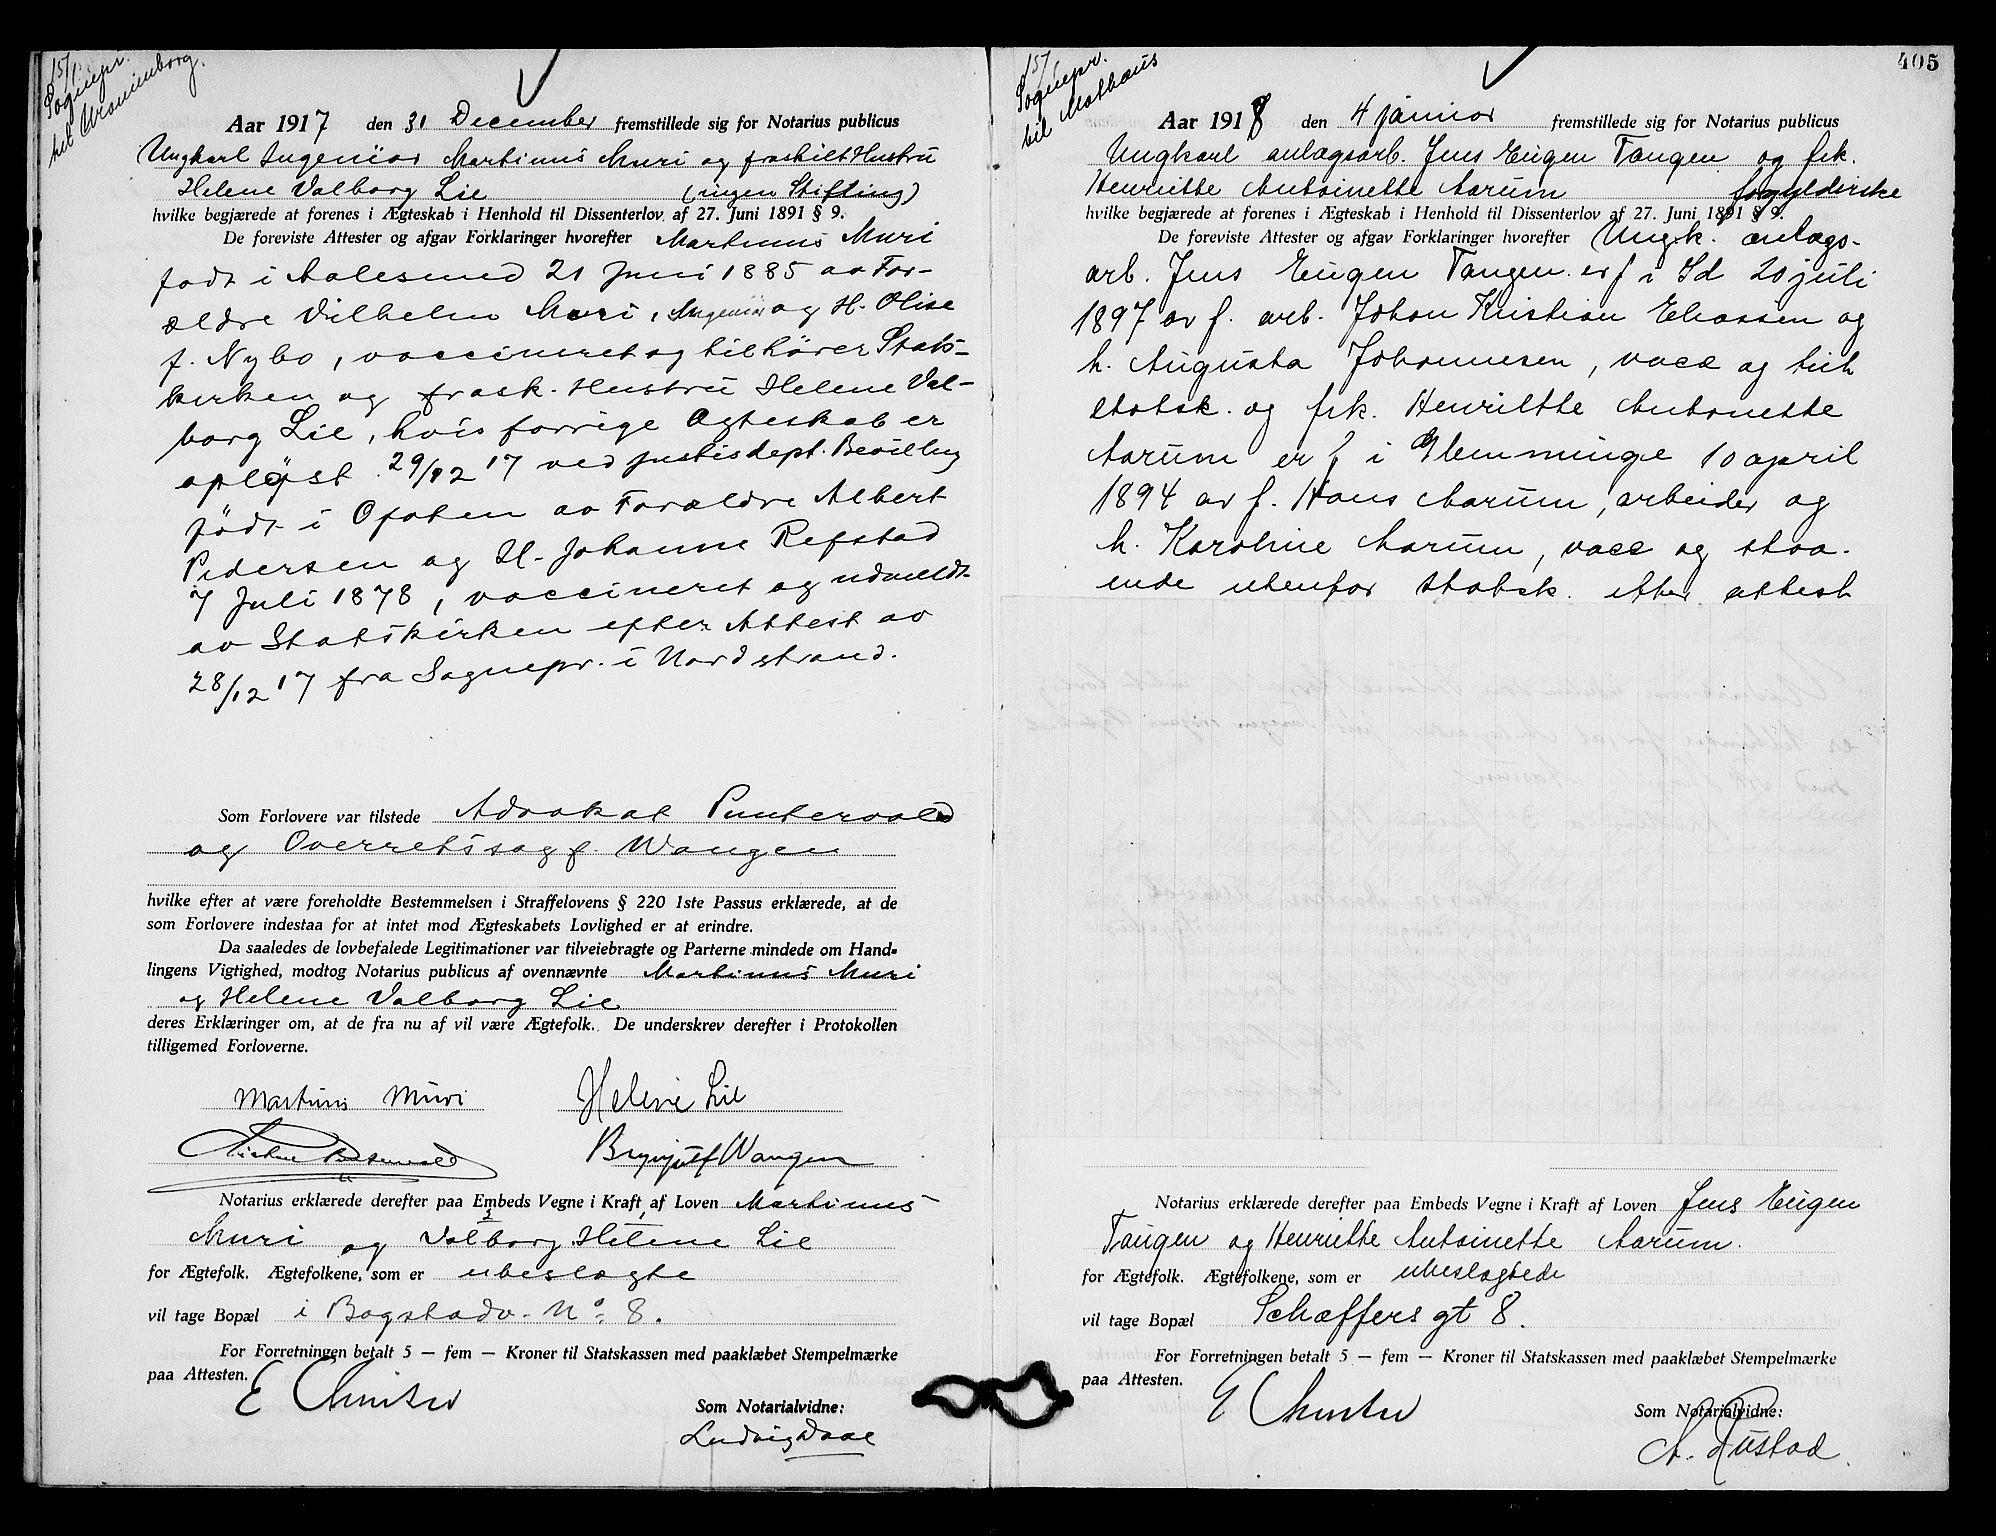 SAO, Oslo byfogd avd. I, L/Lb/Lbb/L0011: Notarialprotokoll, rekke II: Vigsler, 1916-1918, s. 404b-405a